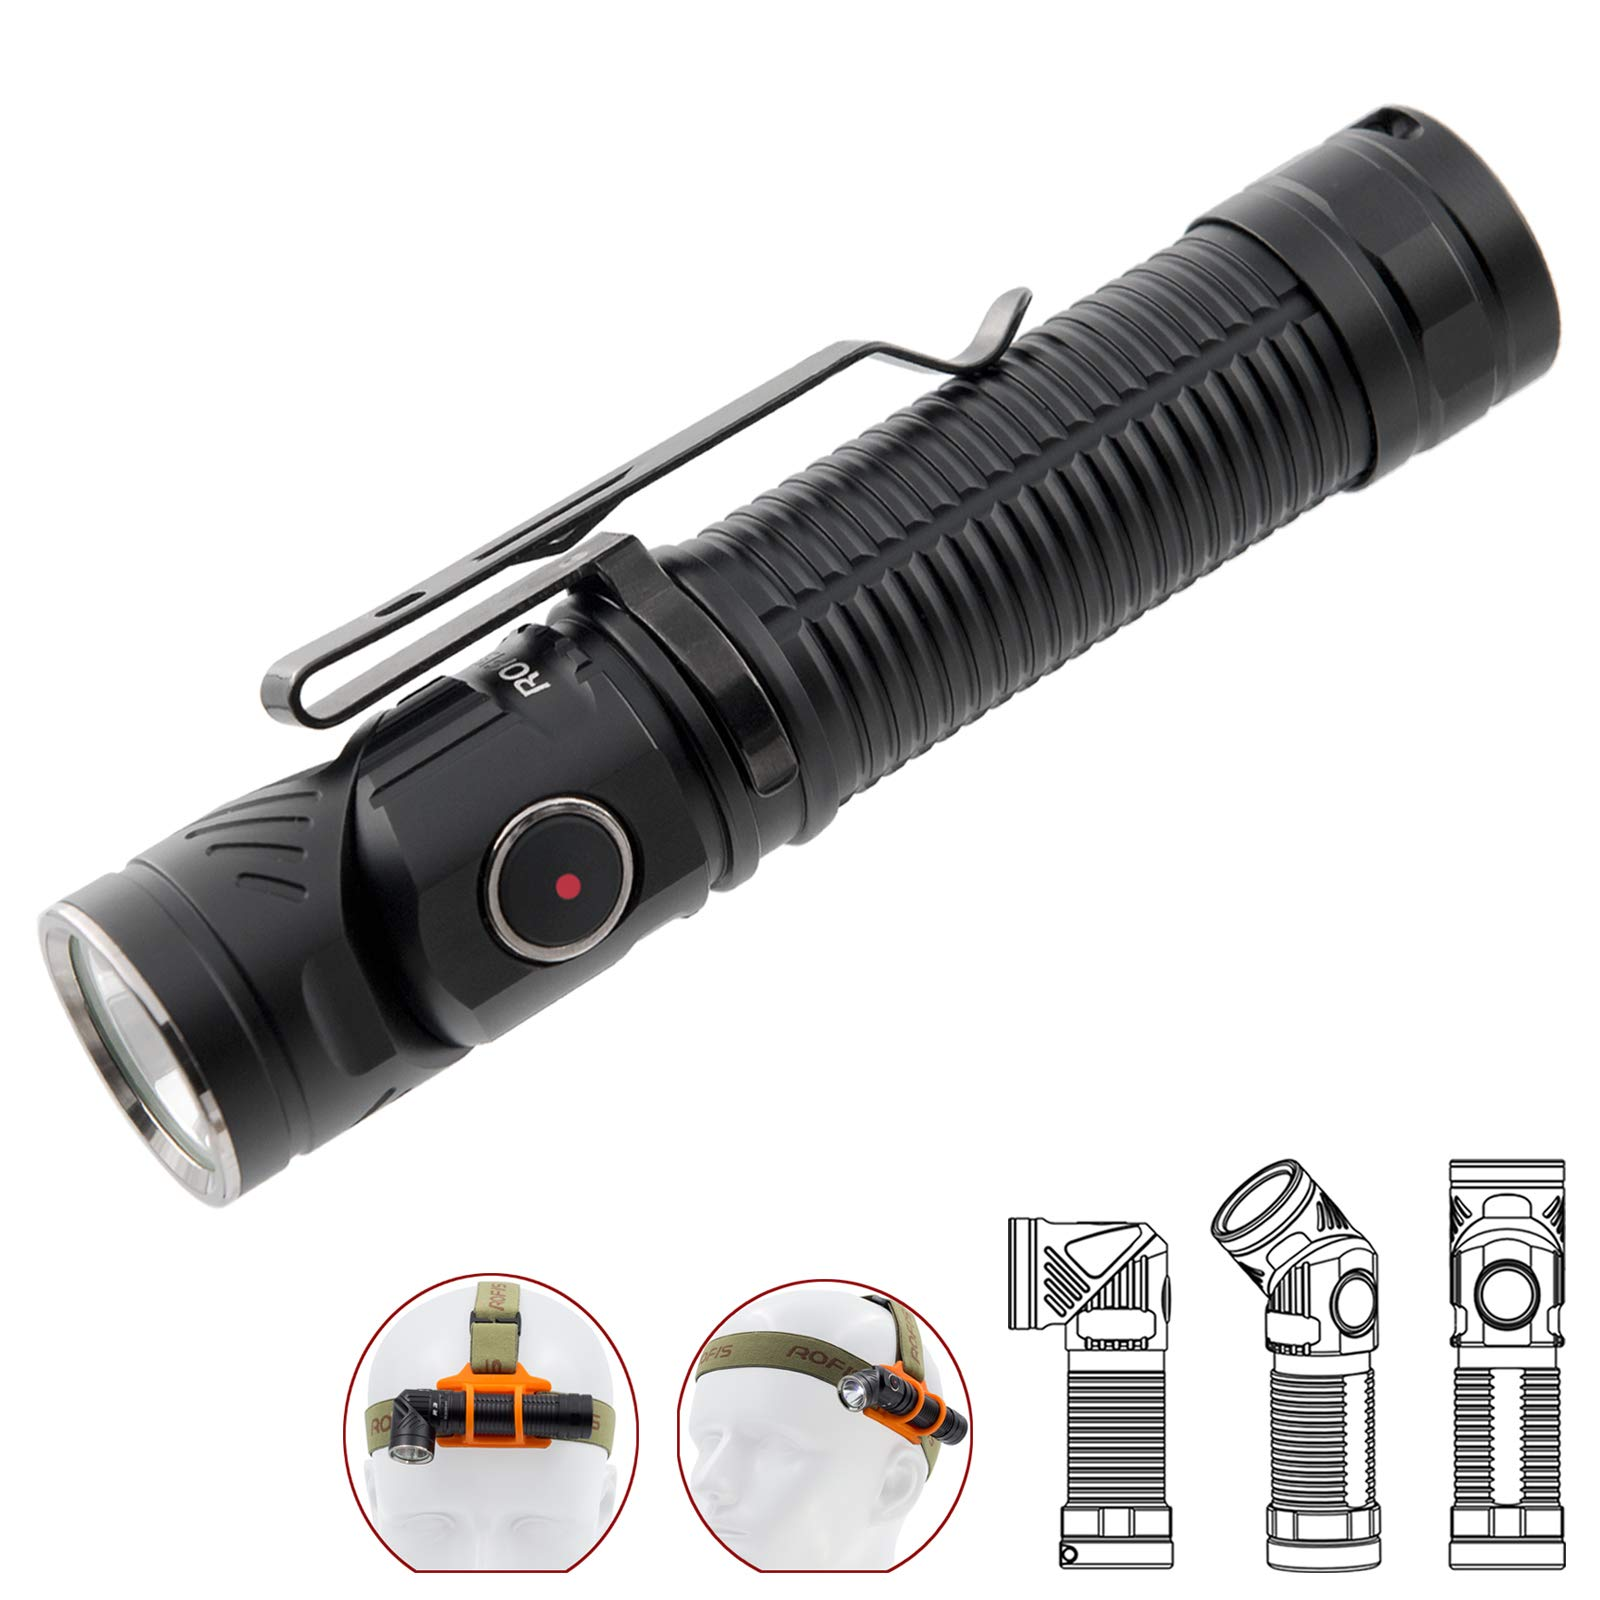 18650 Torch Light 90 Degree Rotation Tail Magnet LED Torch  Bright Flashlight BR